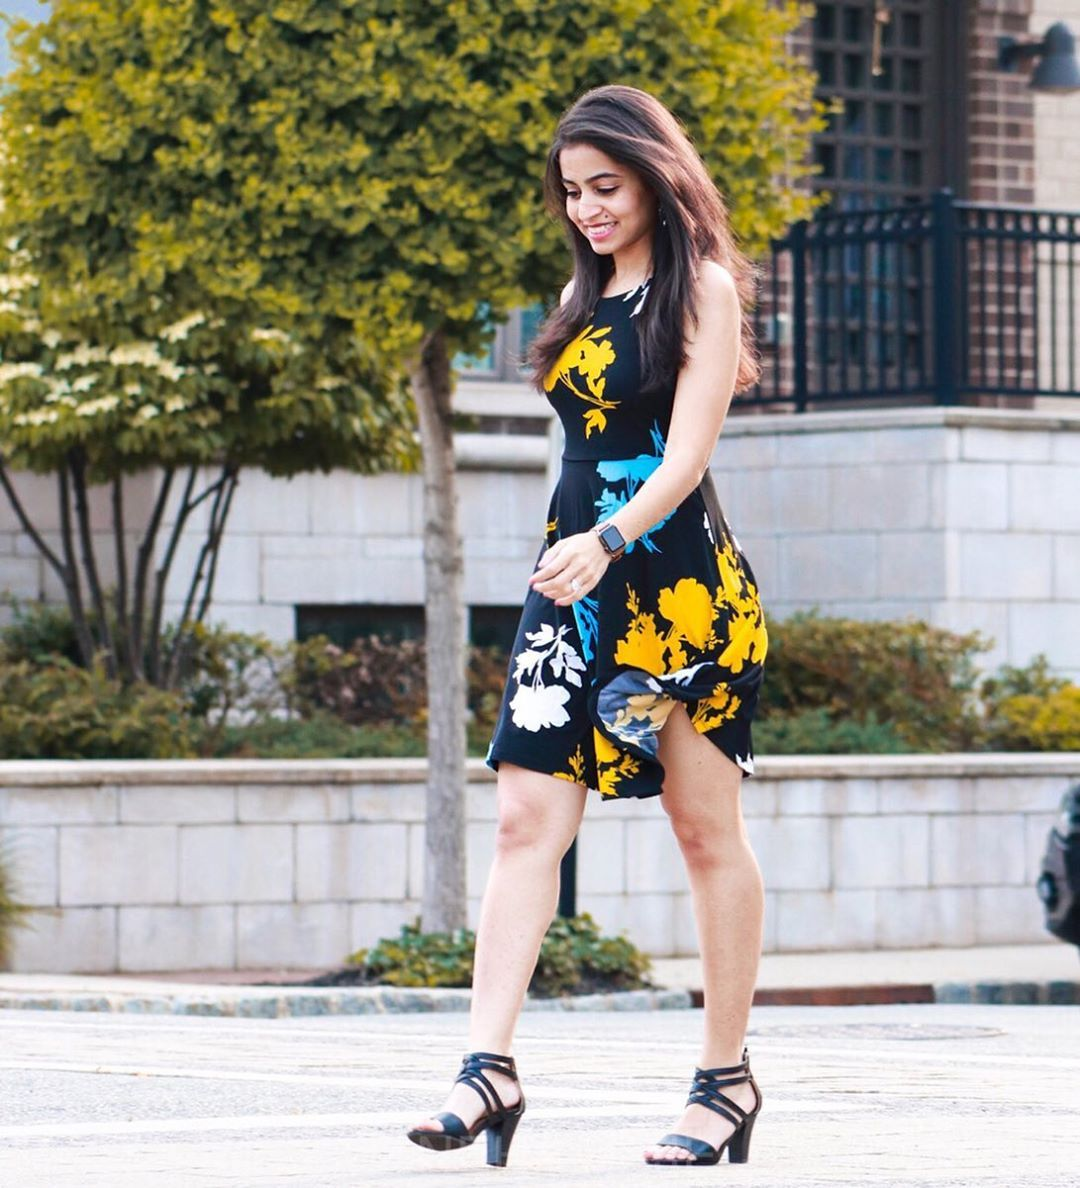 Dress macys sandals jcpenney lifestyleblogger macys